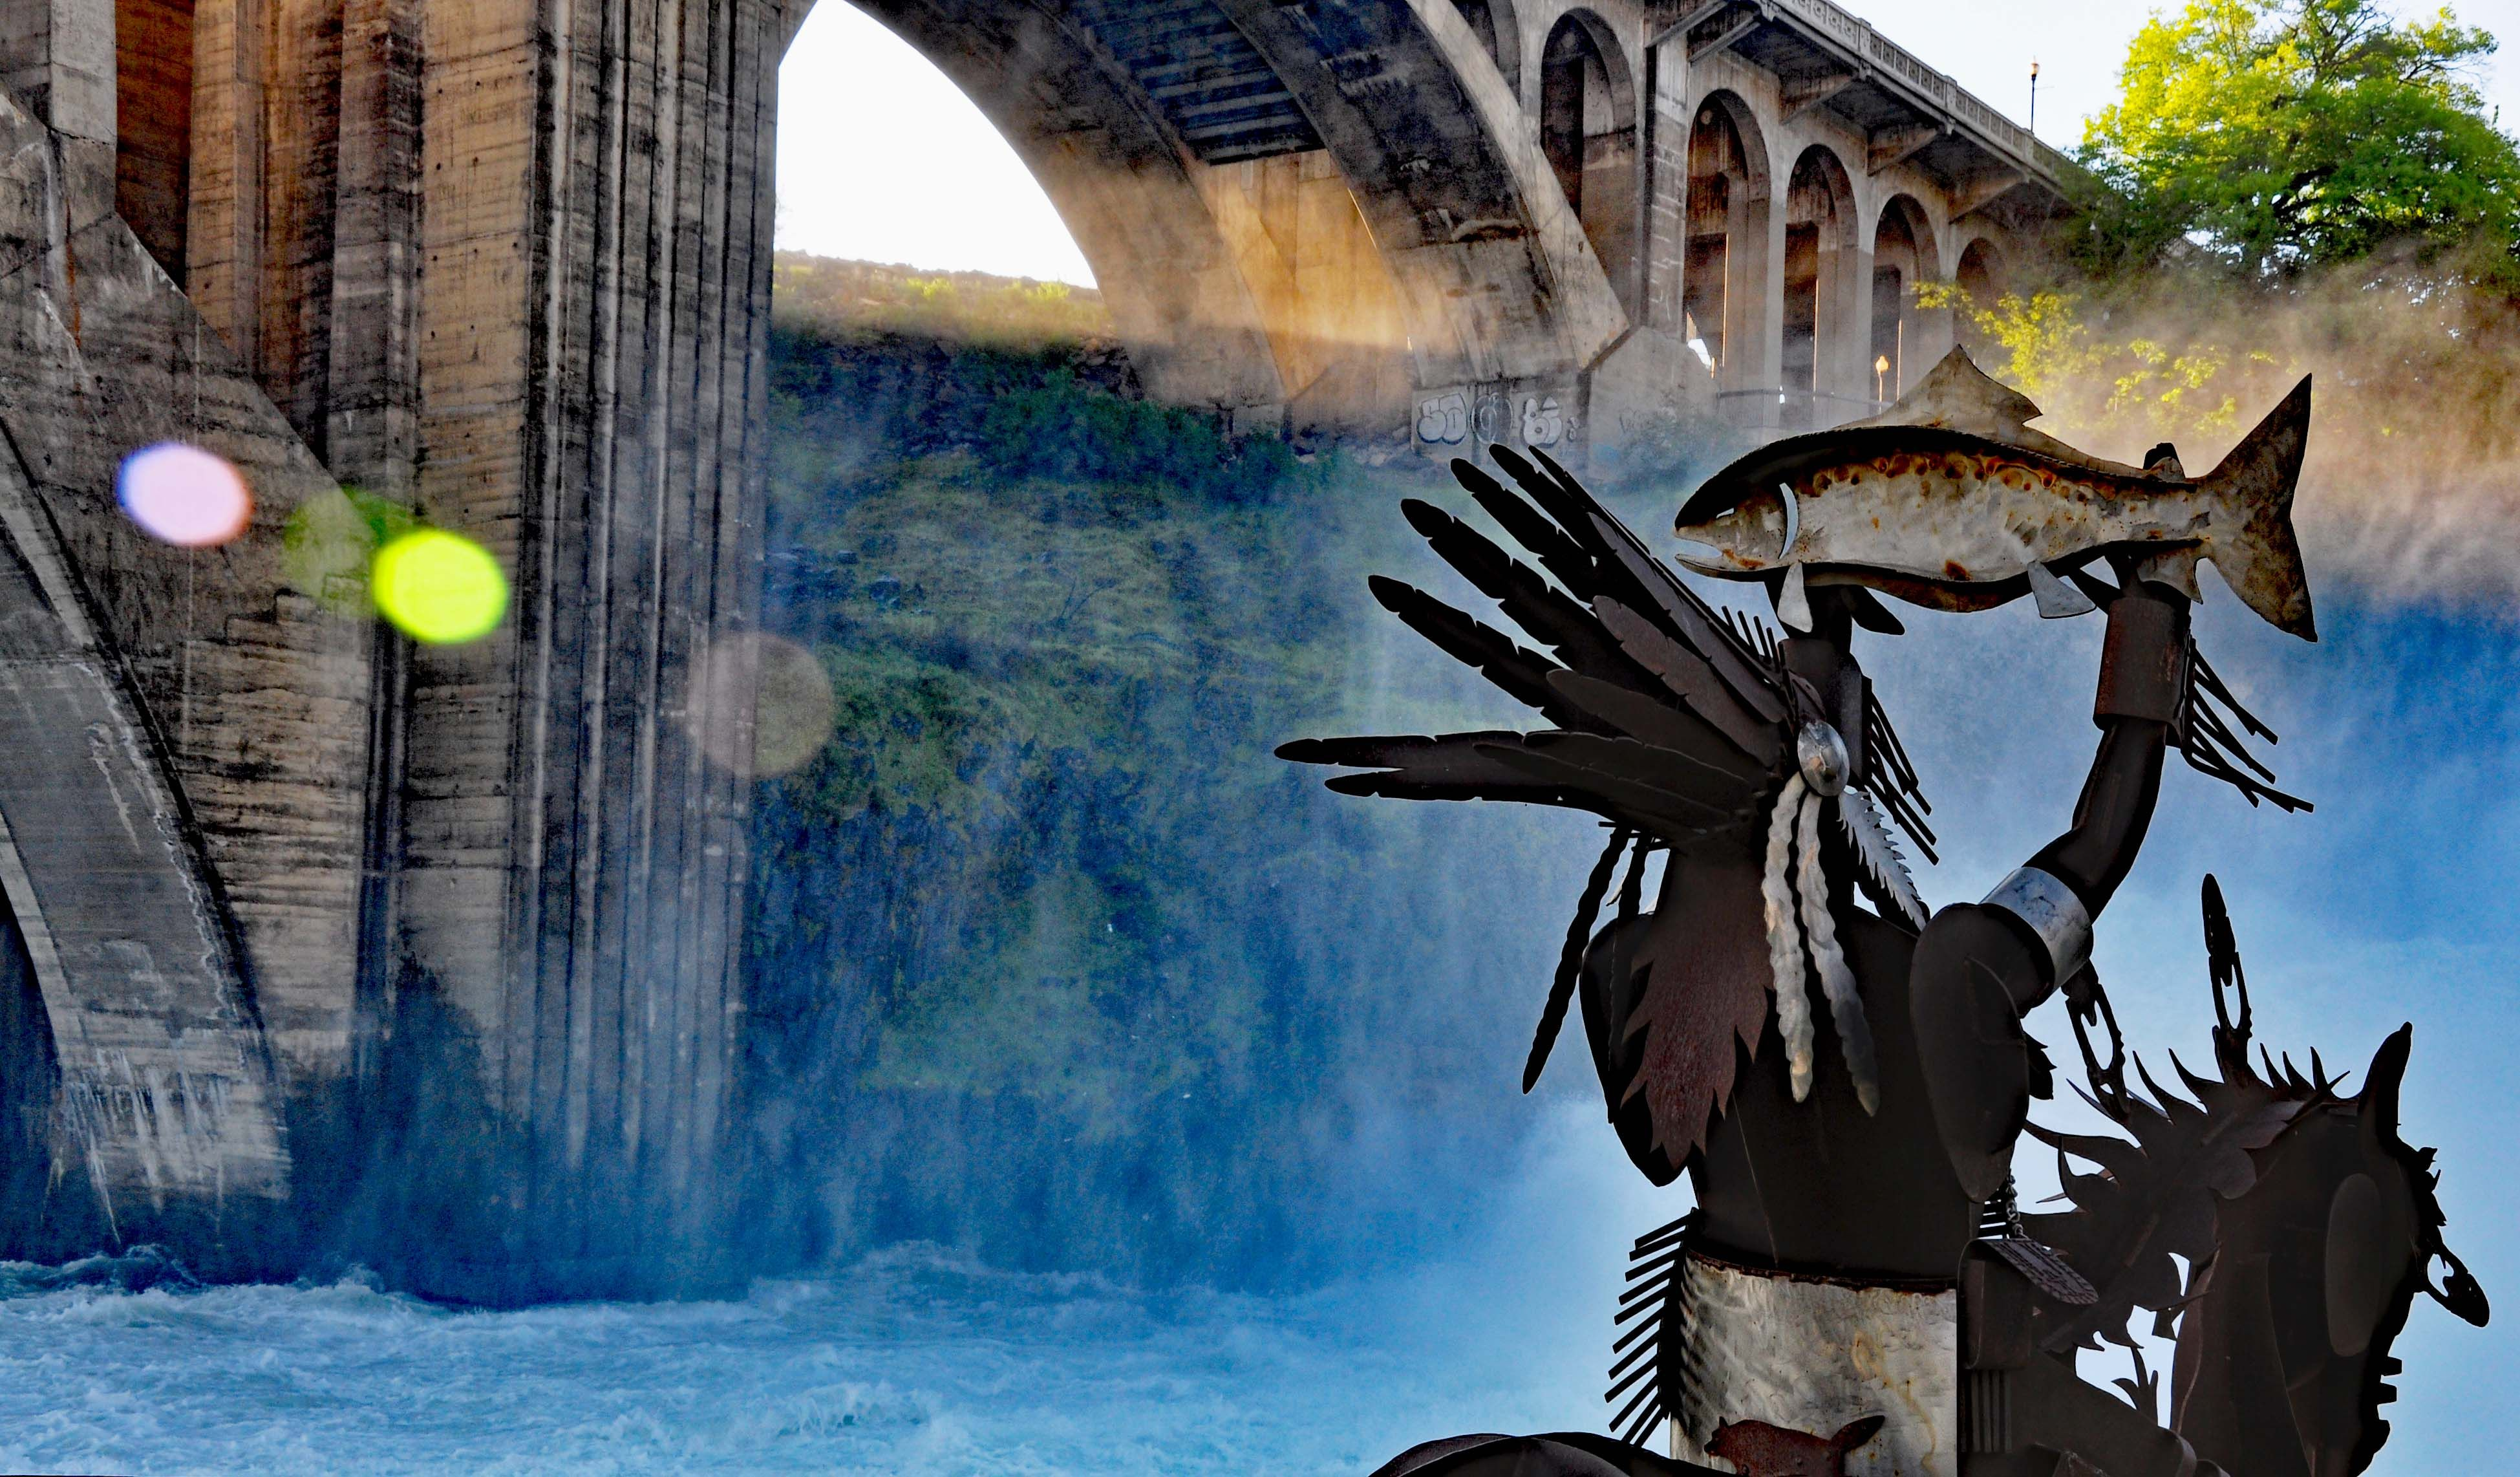 The Salmon Chief Sculpture and Monroe Street Bridge in Spokane, WA ...